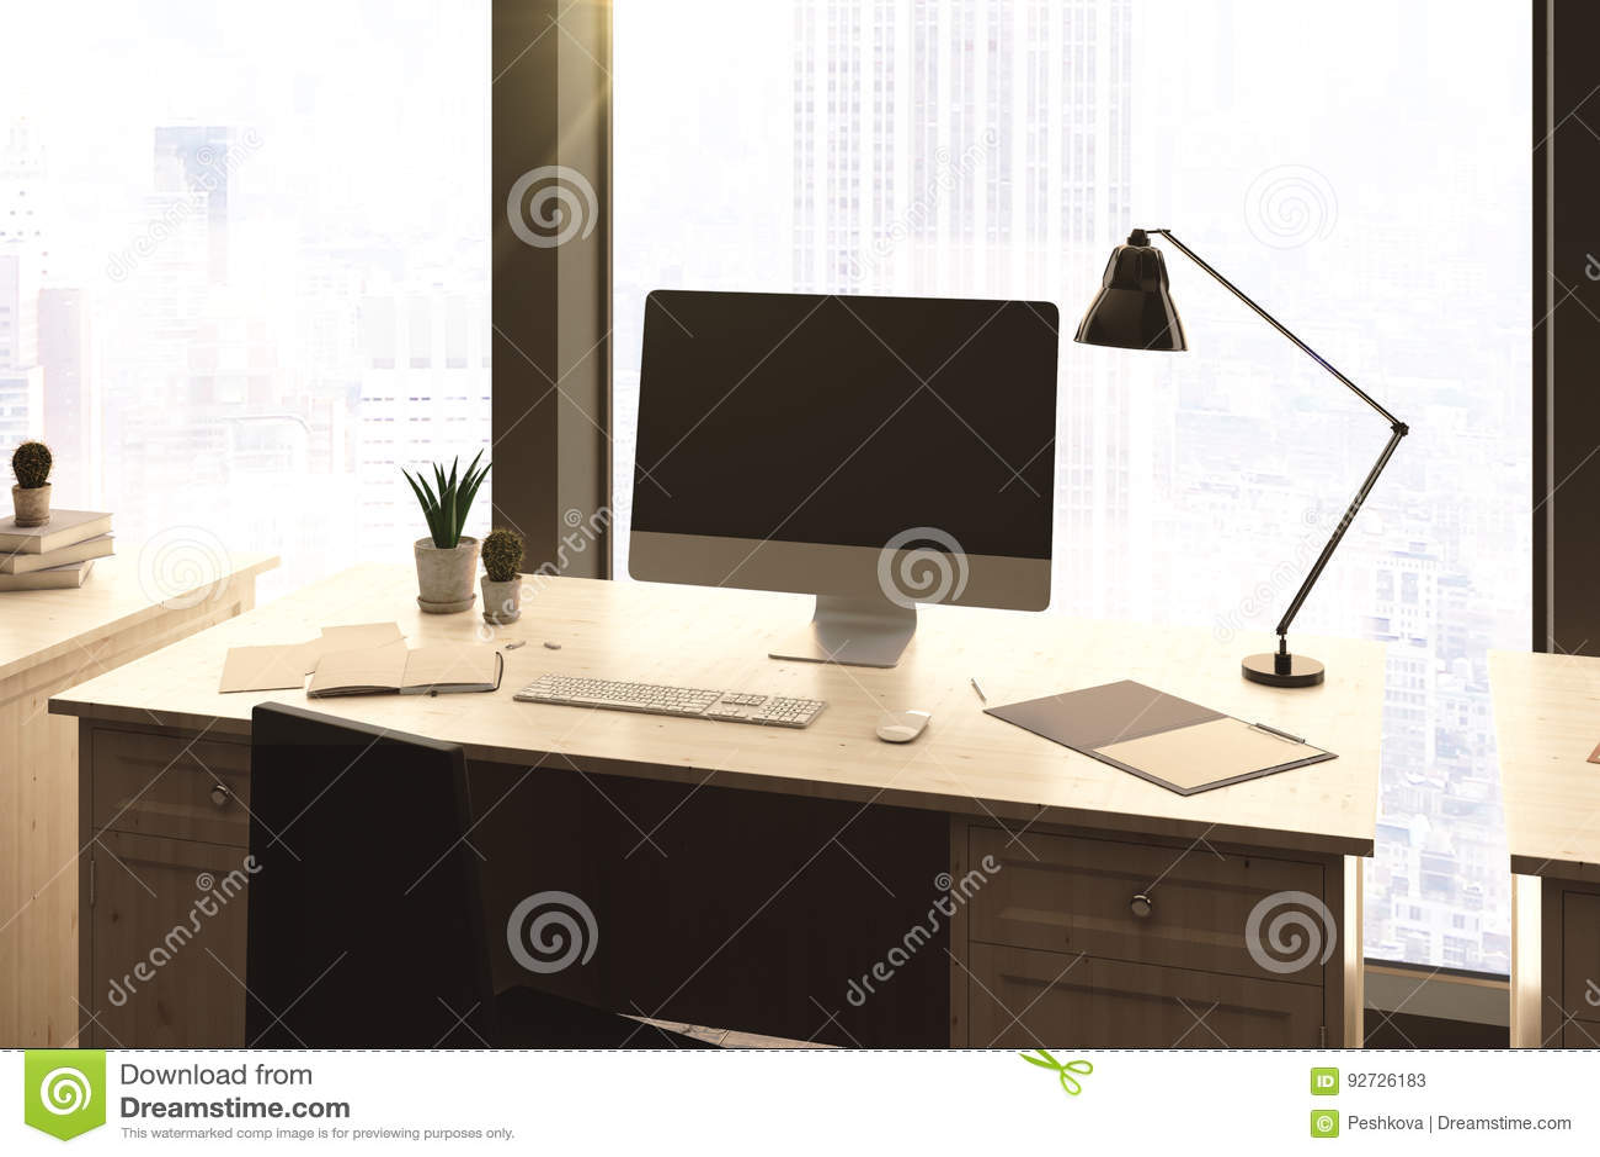 Leerer Computer Im Buro Stock Abbildung Illustration Von Buro 92726183